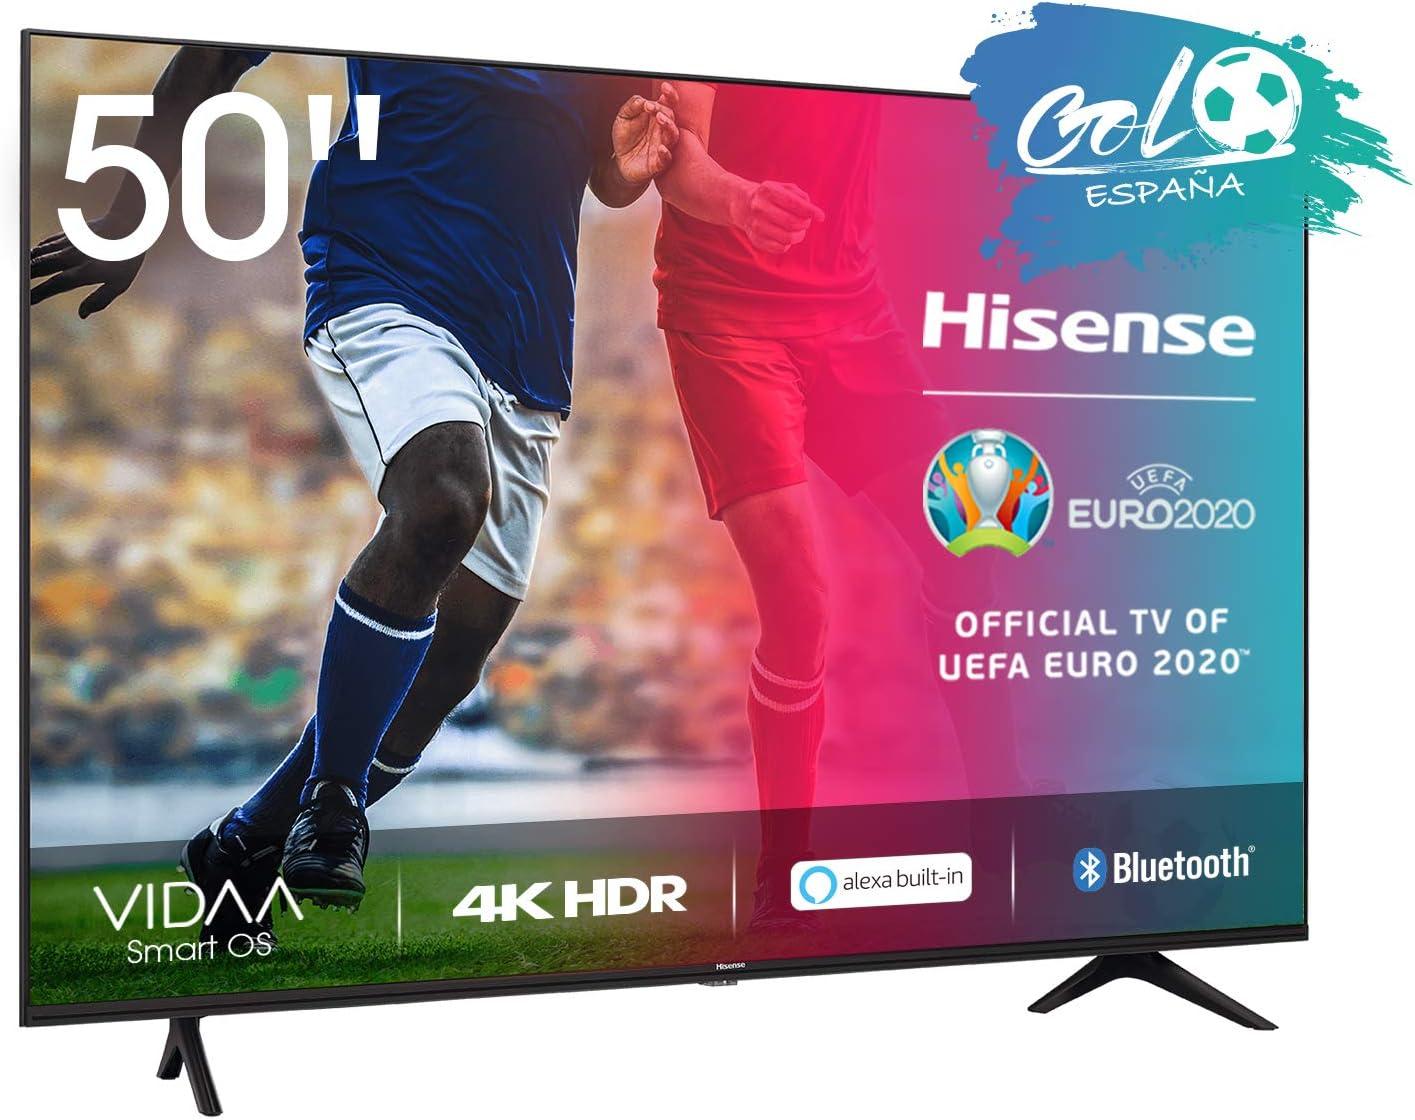 Hisense UHD TV 2020 50AE7000F - Smart TV Resolución 4K